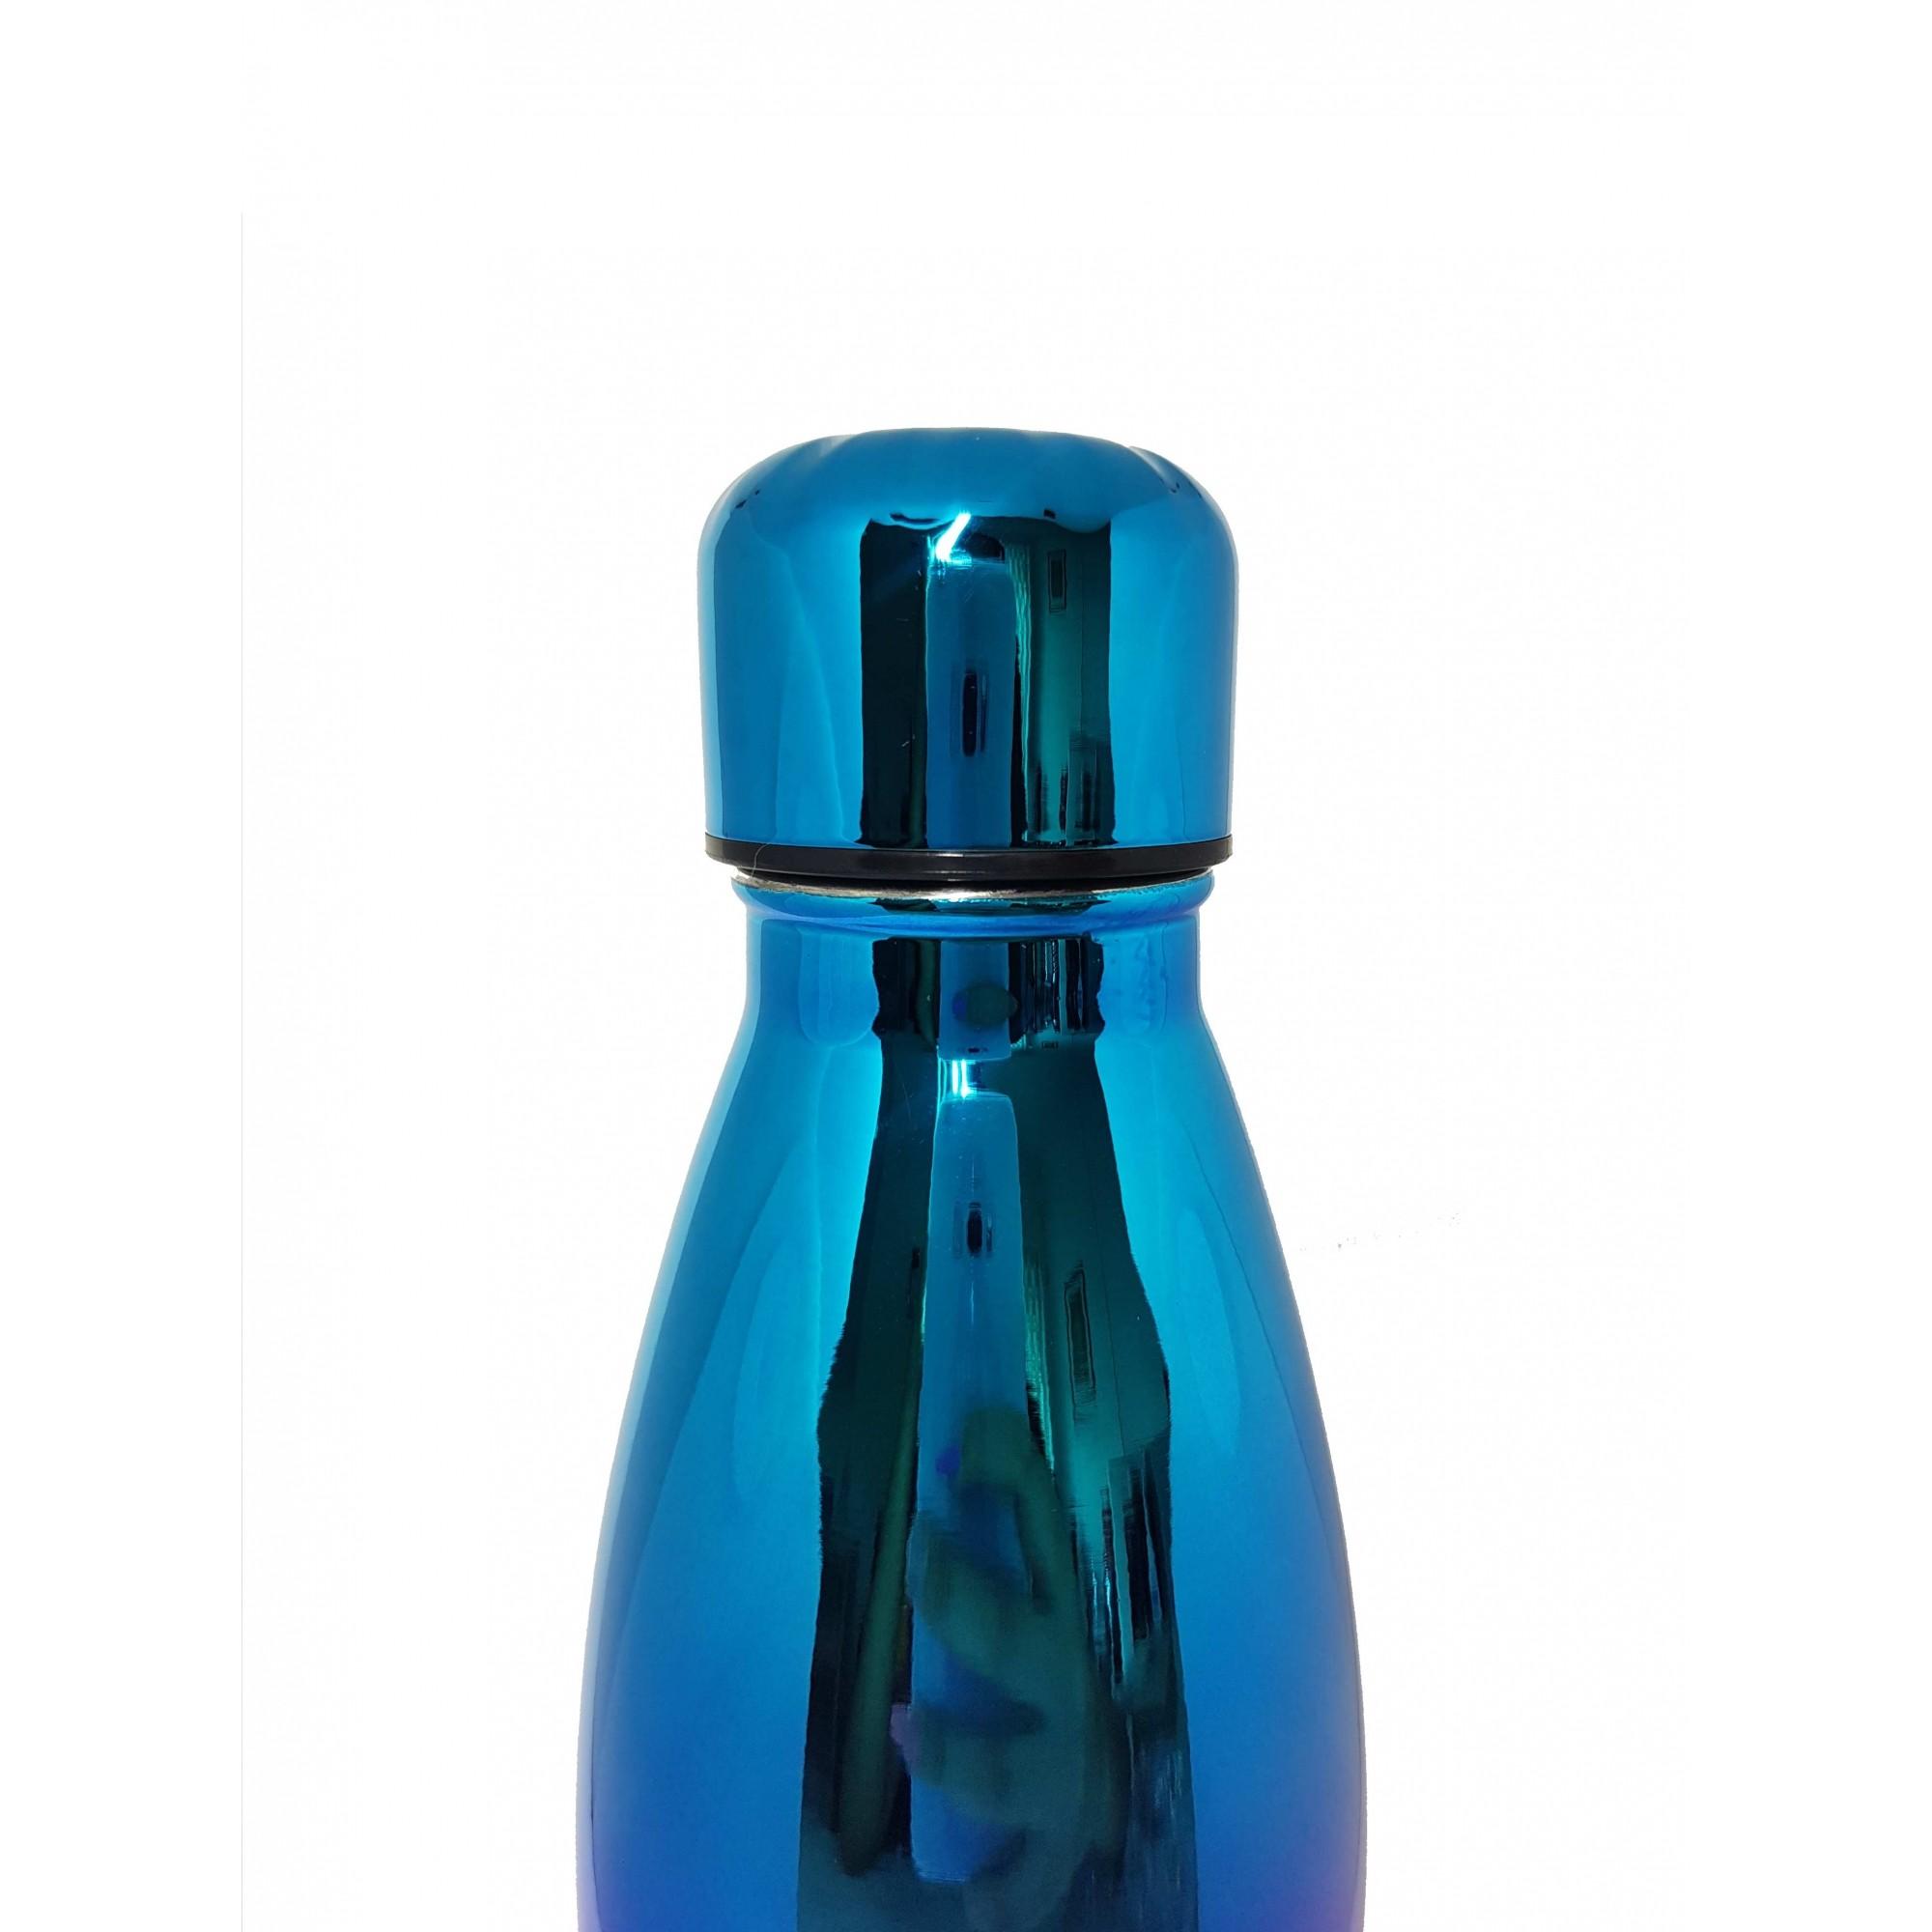 Kit Mundo Bolsa papel + garrafa Holográfica + kit 5 em 1 inox Roxo